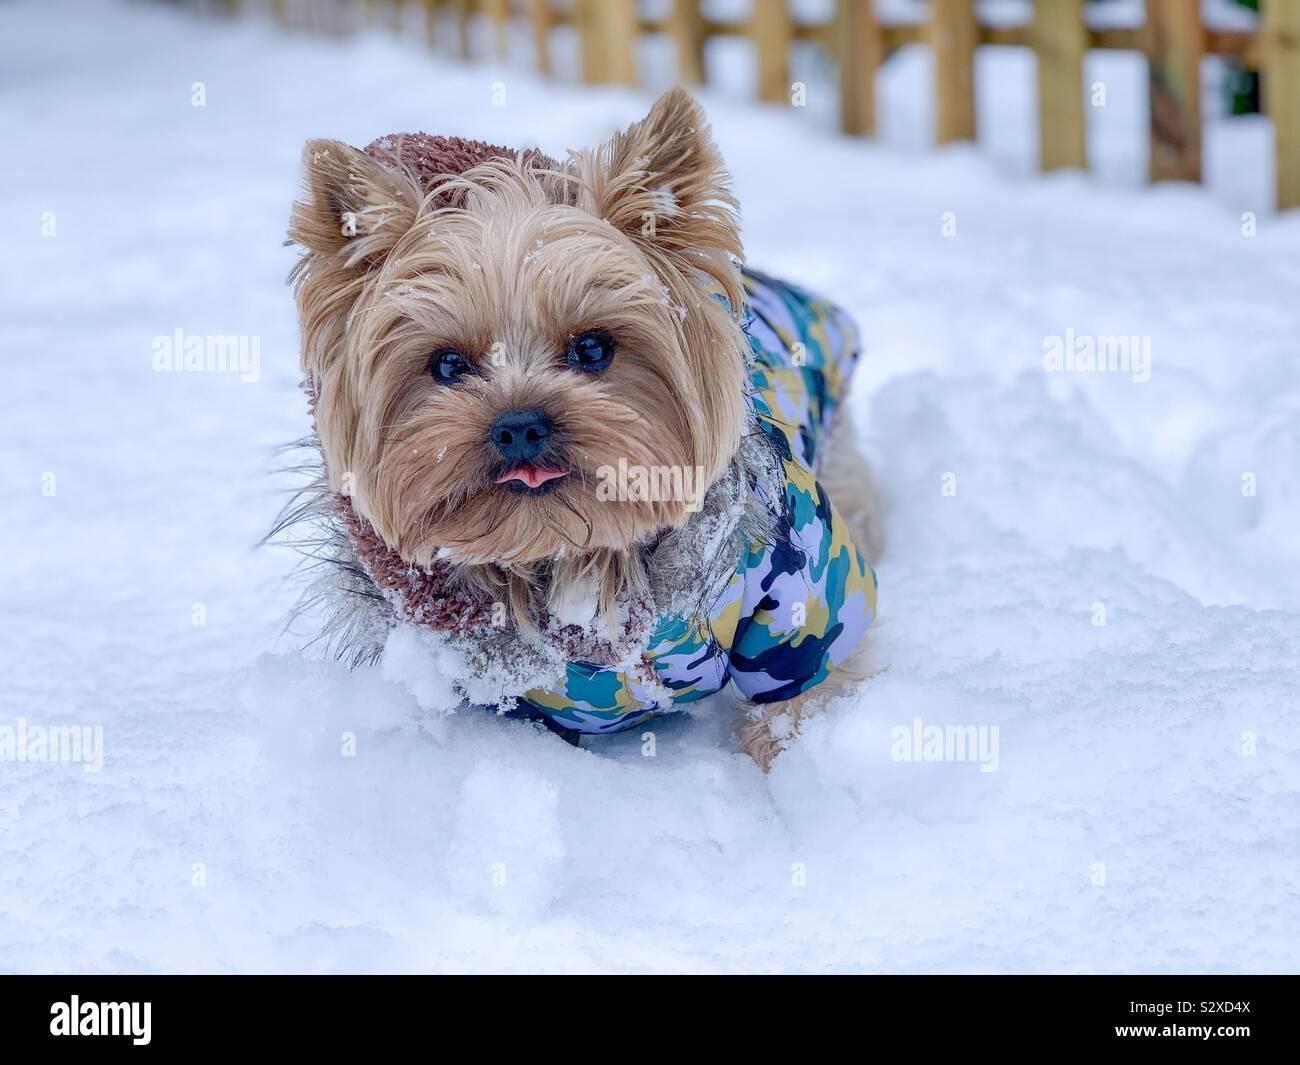 Giornate fredde Foto Stock